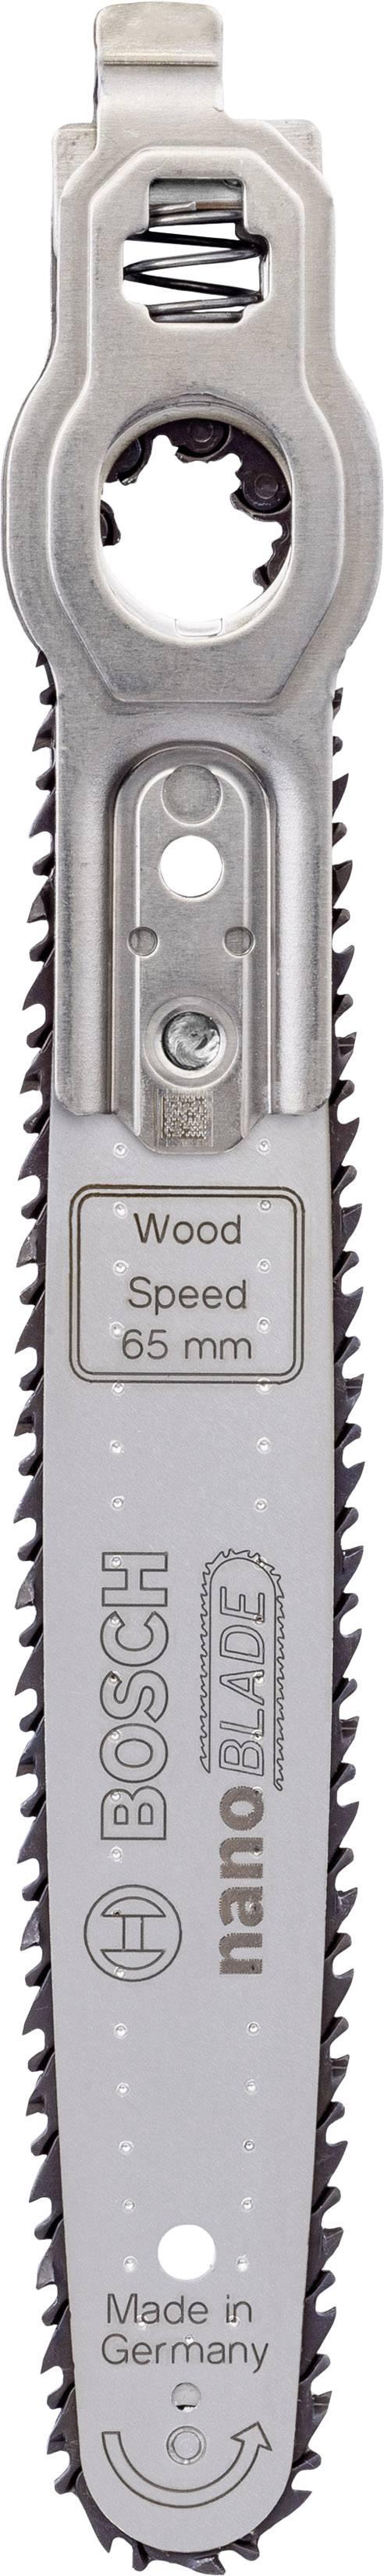 Mikro pílová lišta s reťazou Bosch Accessories nanoBLADE Wood Speed 65 2609256D86, pre EasyCut 50, EasyCut 12, AdvancedCut 50